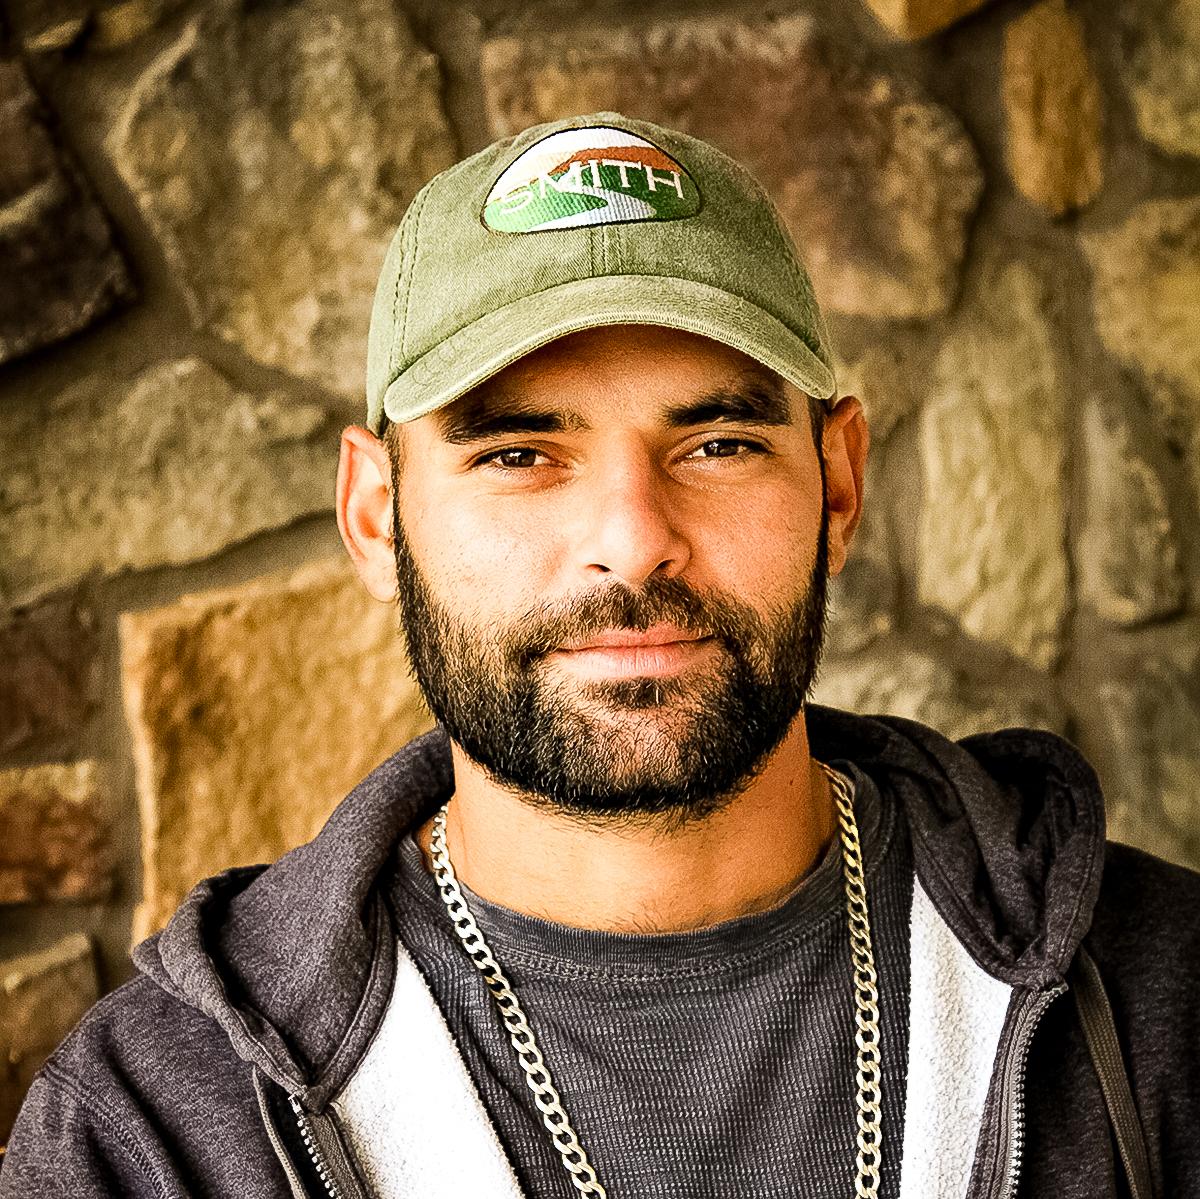 Emmanuel Mederos